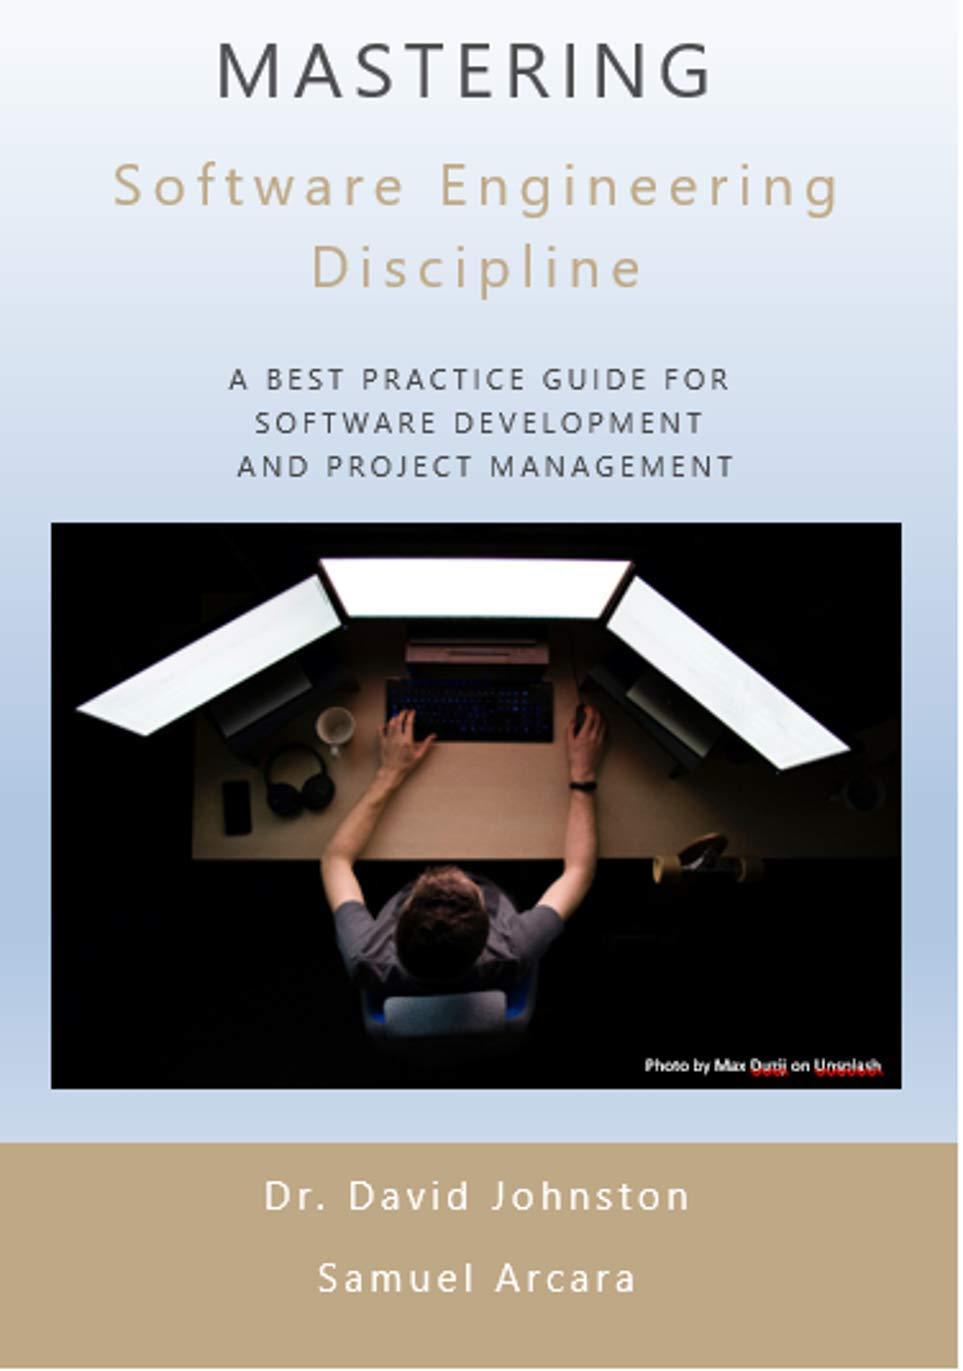 Mastering Software Engineering Discipline